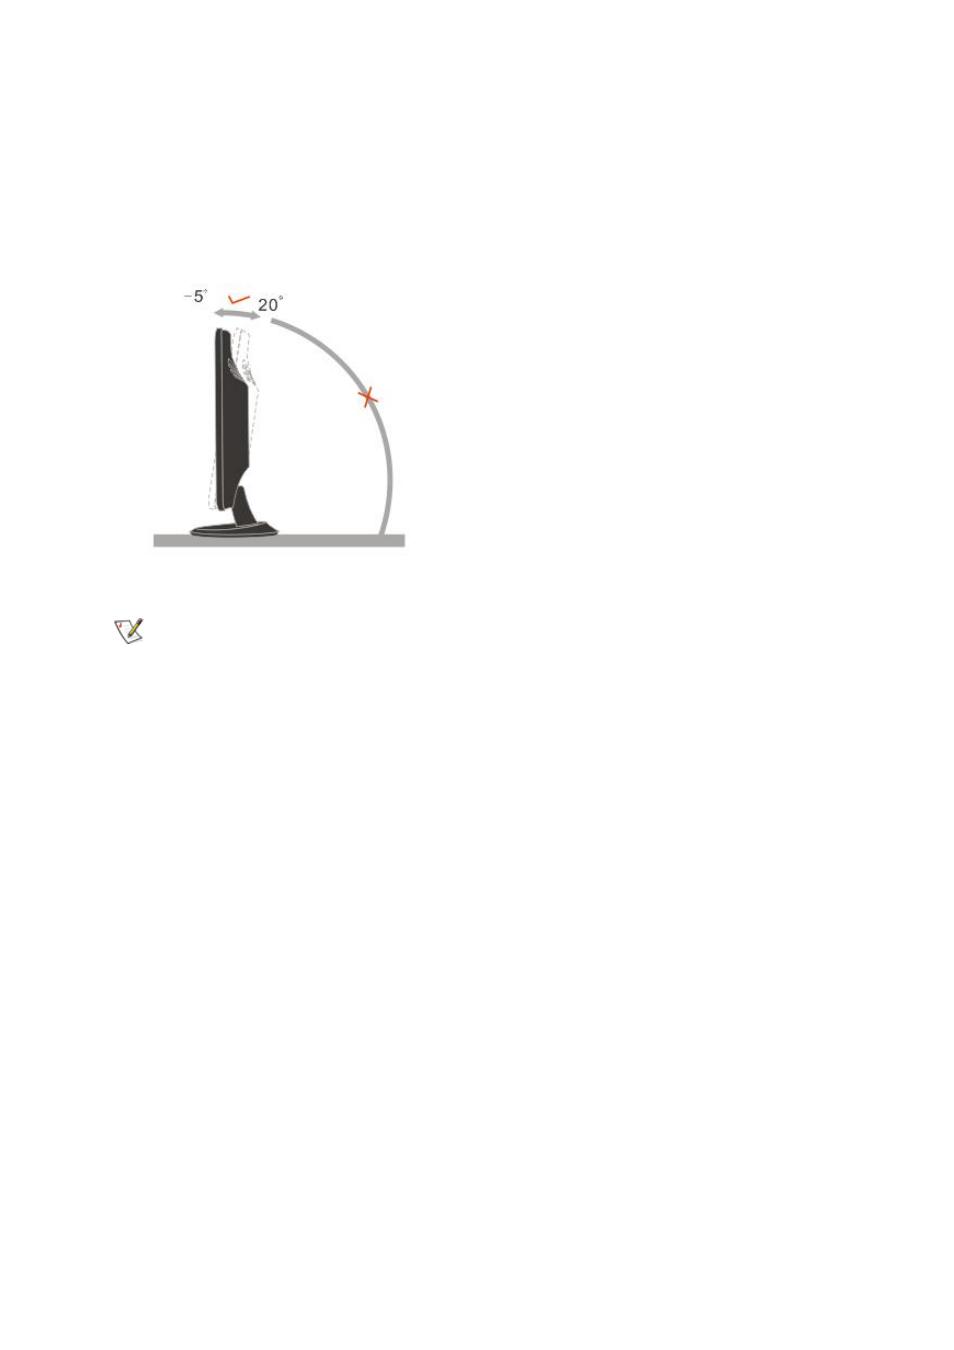 adjusting viewing angle aoc 2436vh user manual page 12 61 rh manualsdir com Operators Manual Owner's Manual